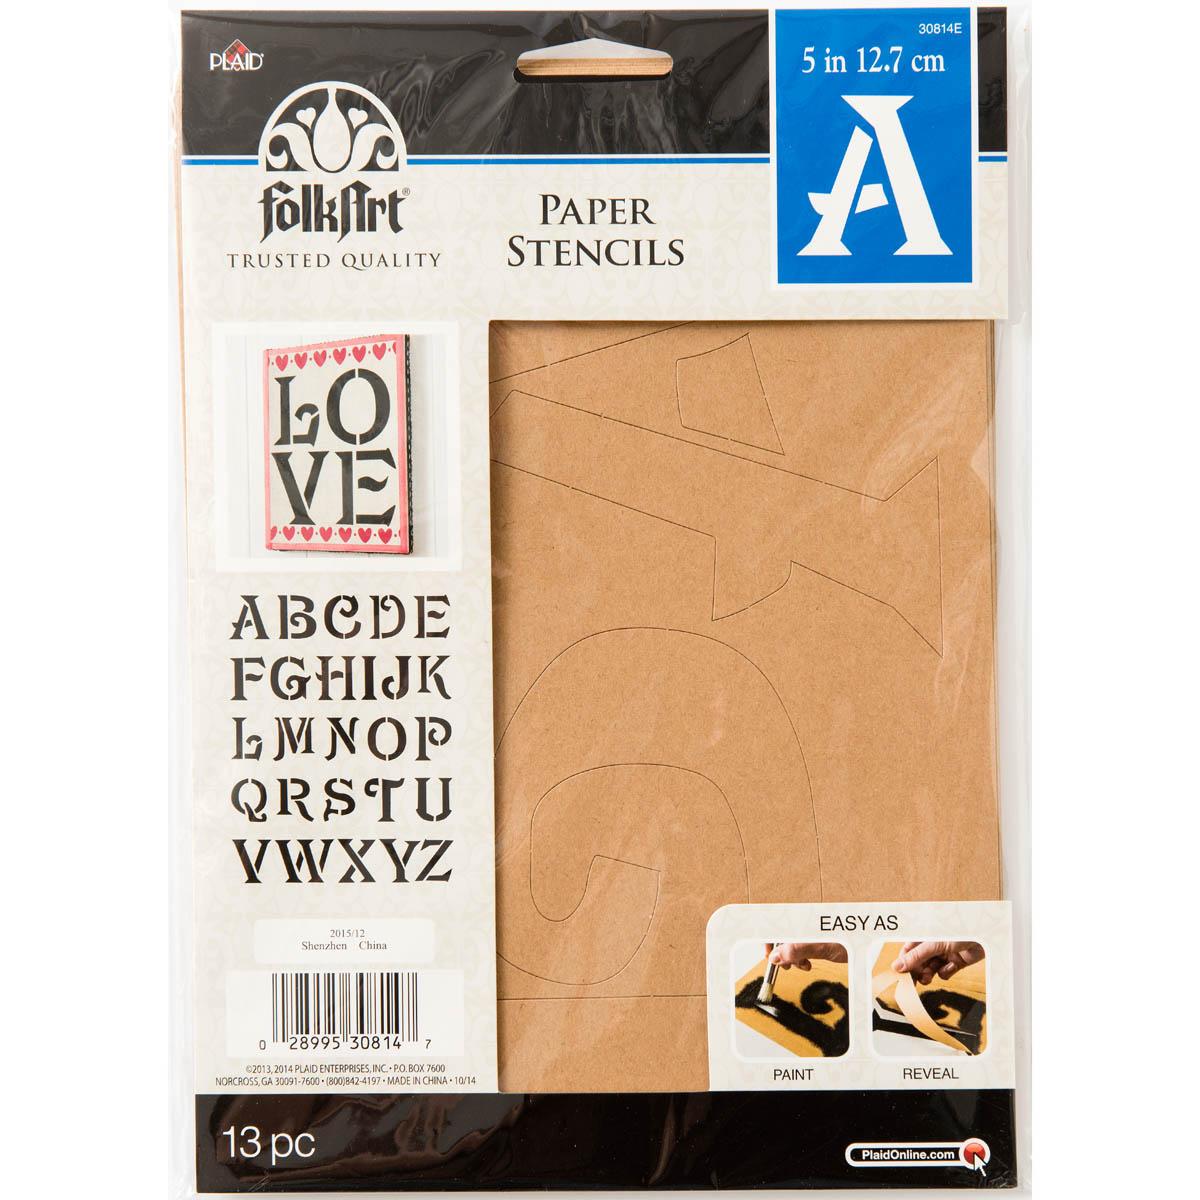 Plaid ® Stencils - Value Packs - Letter Stencils - Sinbad, 5